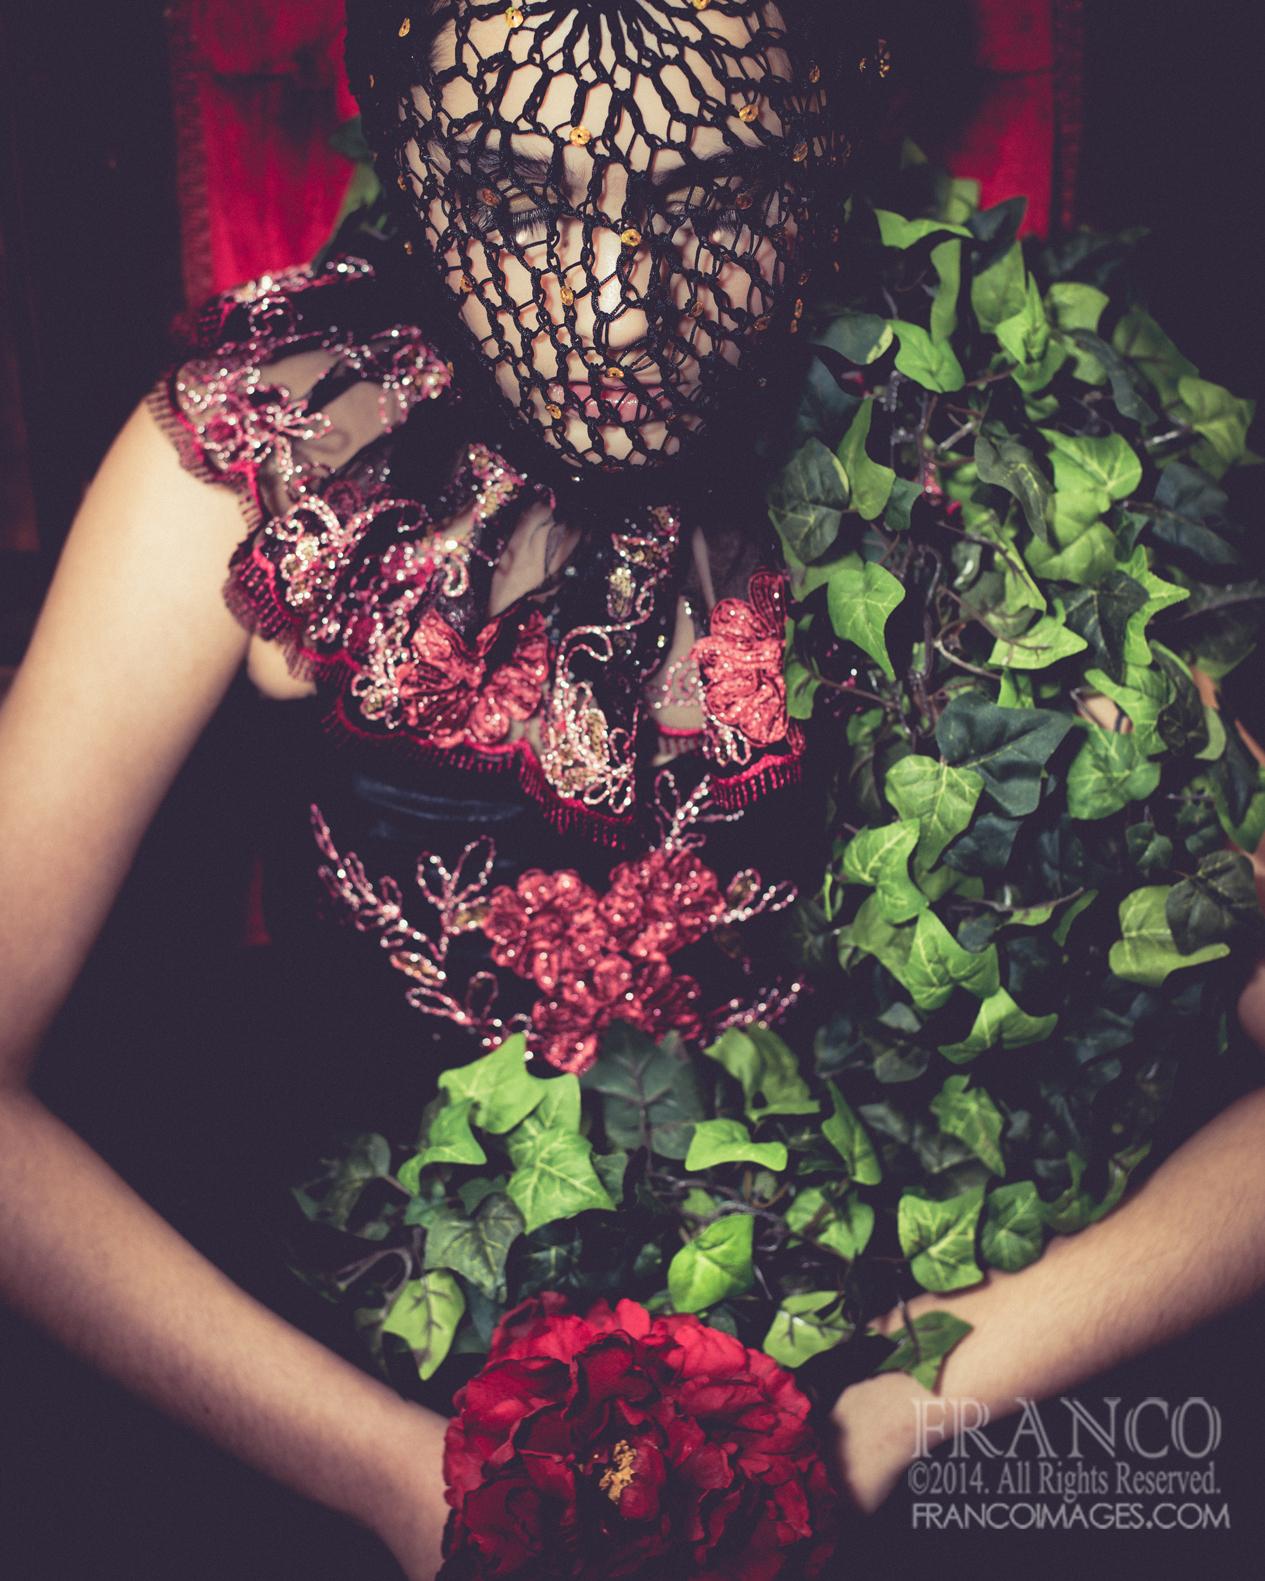 Edward-Franco-Photography-3922V.jpg